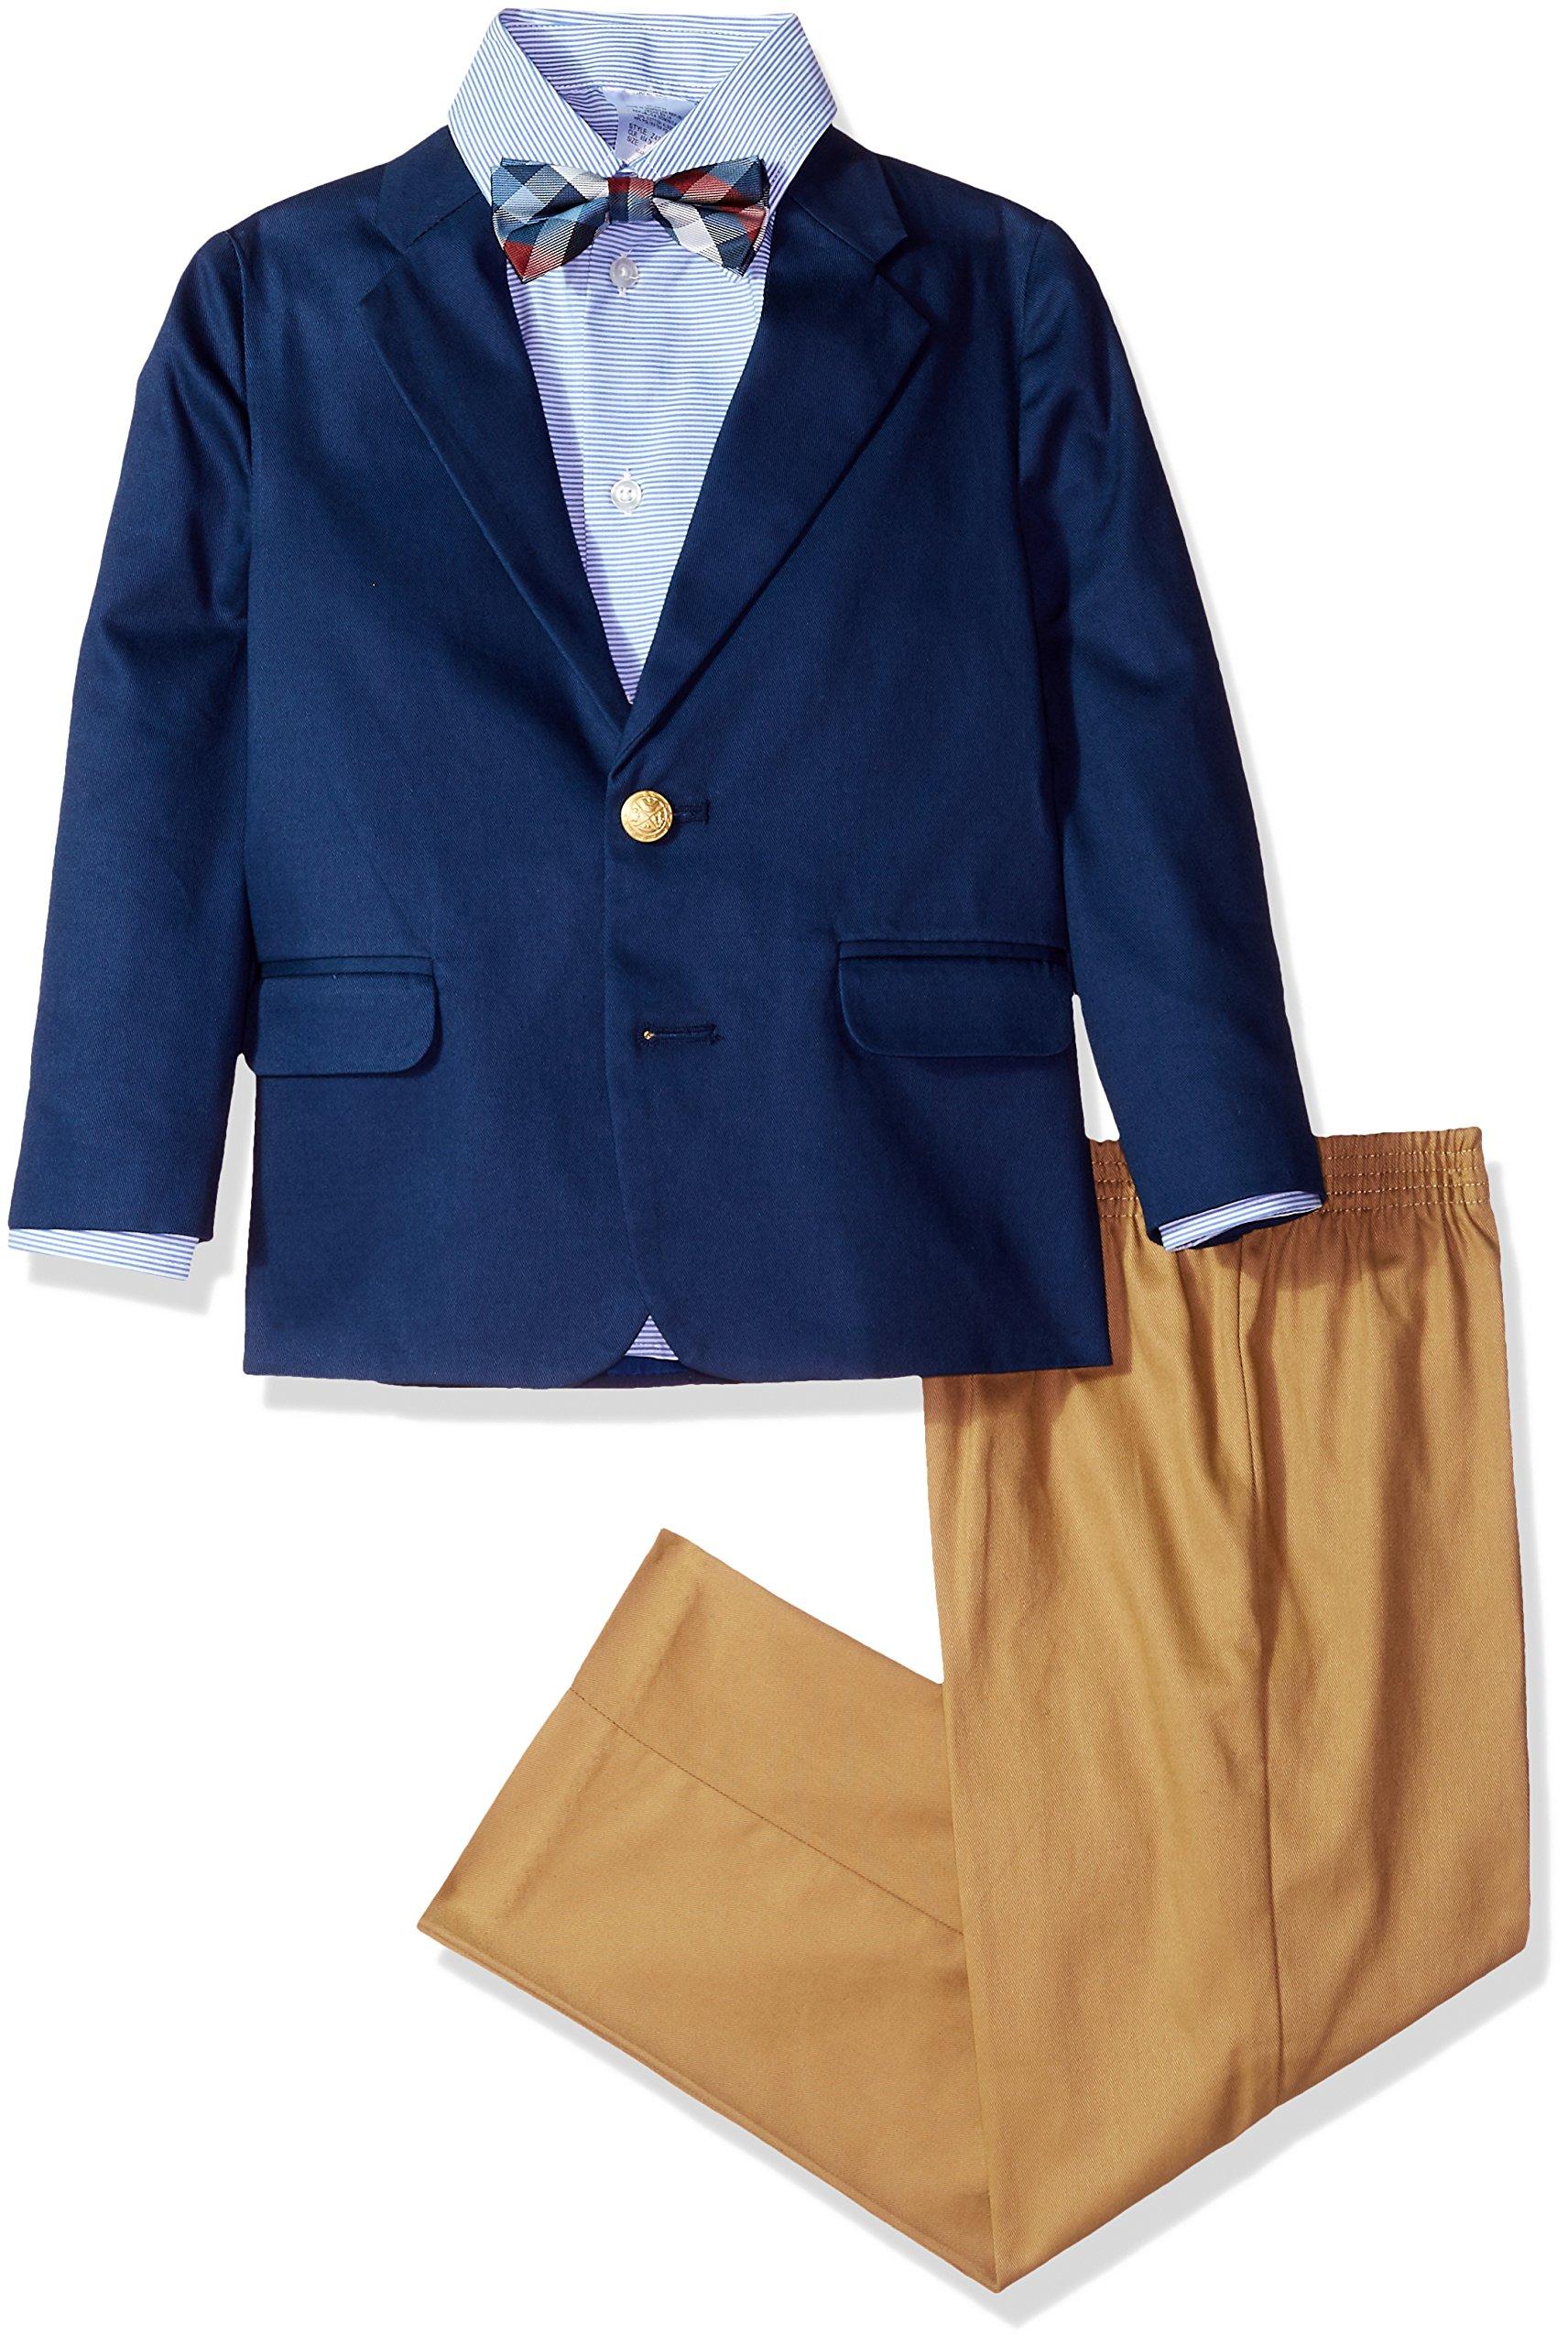 IZOD Kids Little Boys' Four Piece Formal Suit Set, Dark Blue, 6